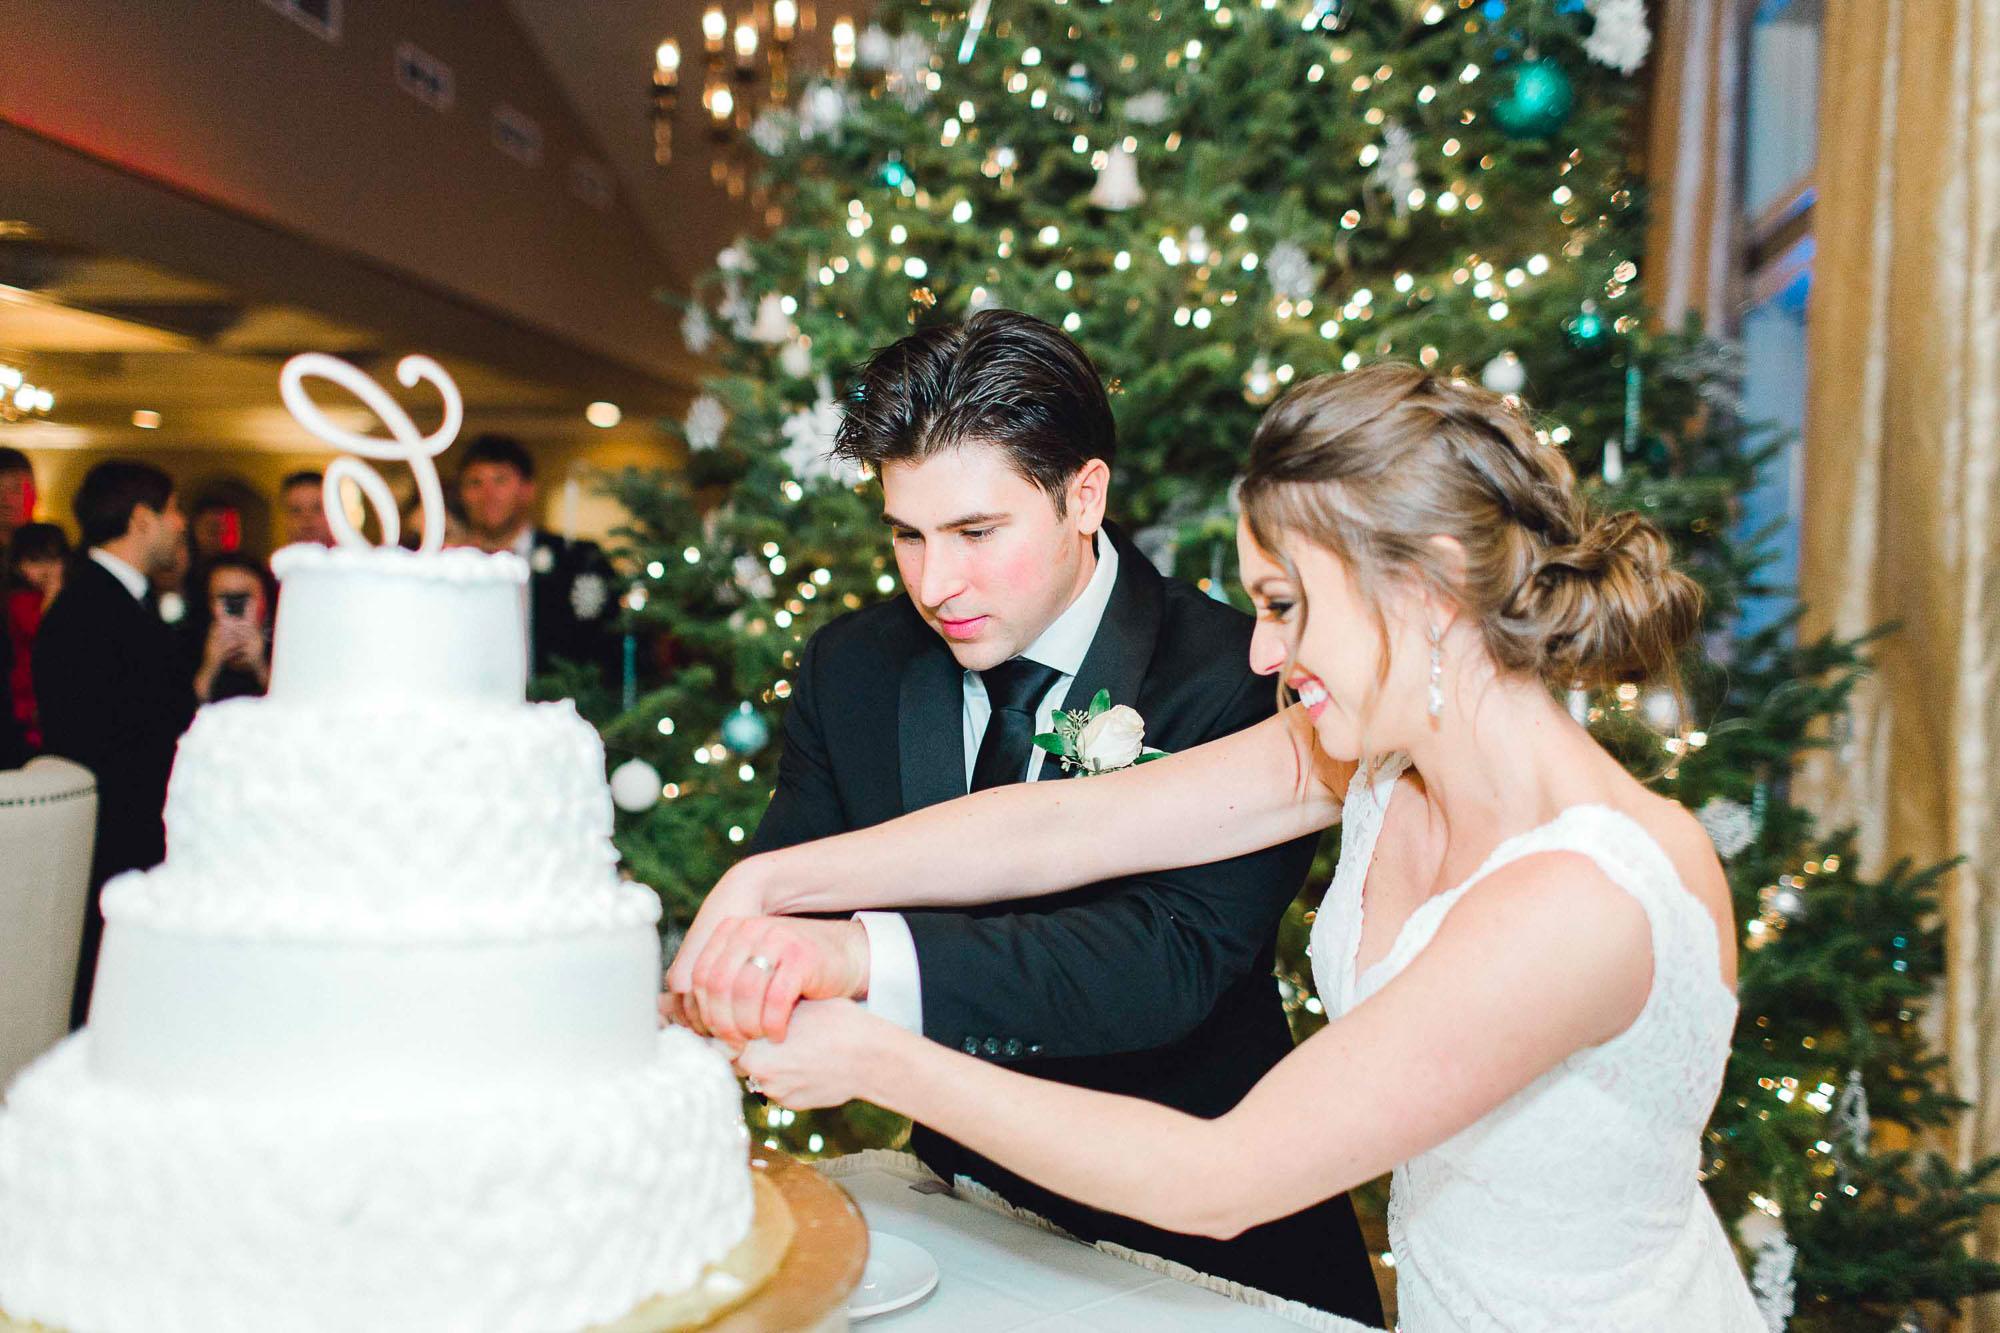 snowy-sand-springs-country-club-drums-pa-christmas-wedding-35138.jpg